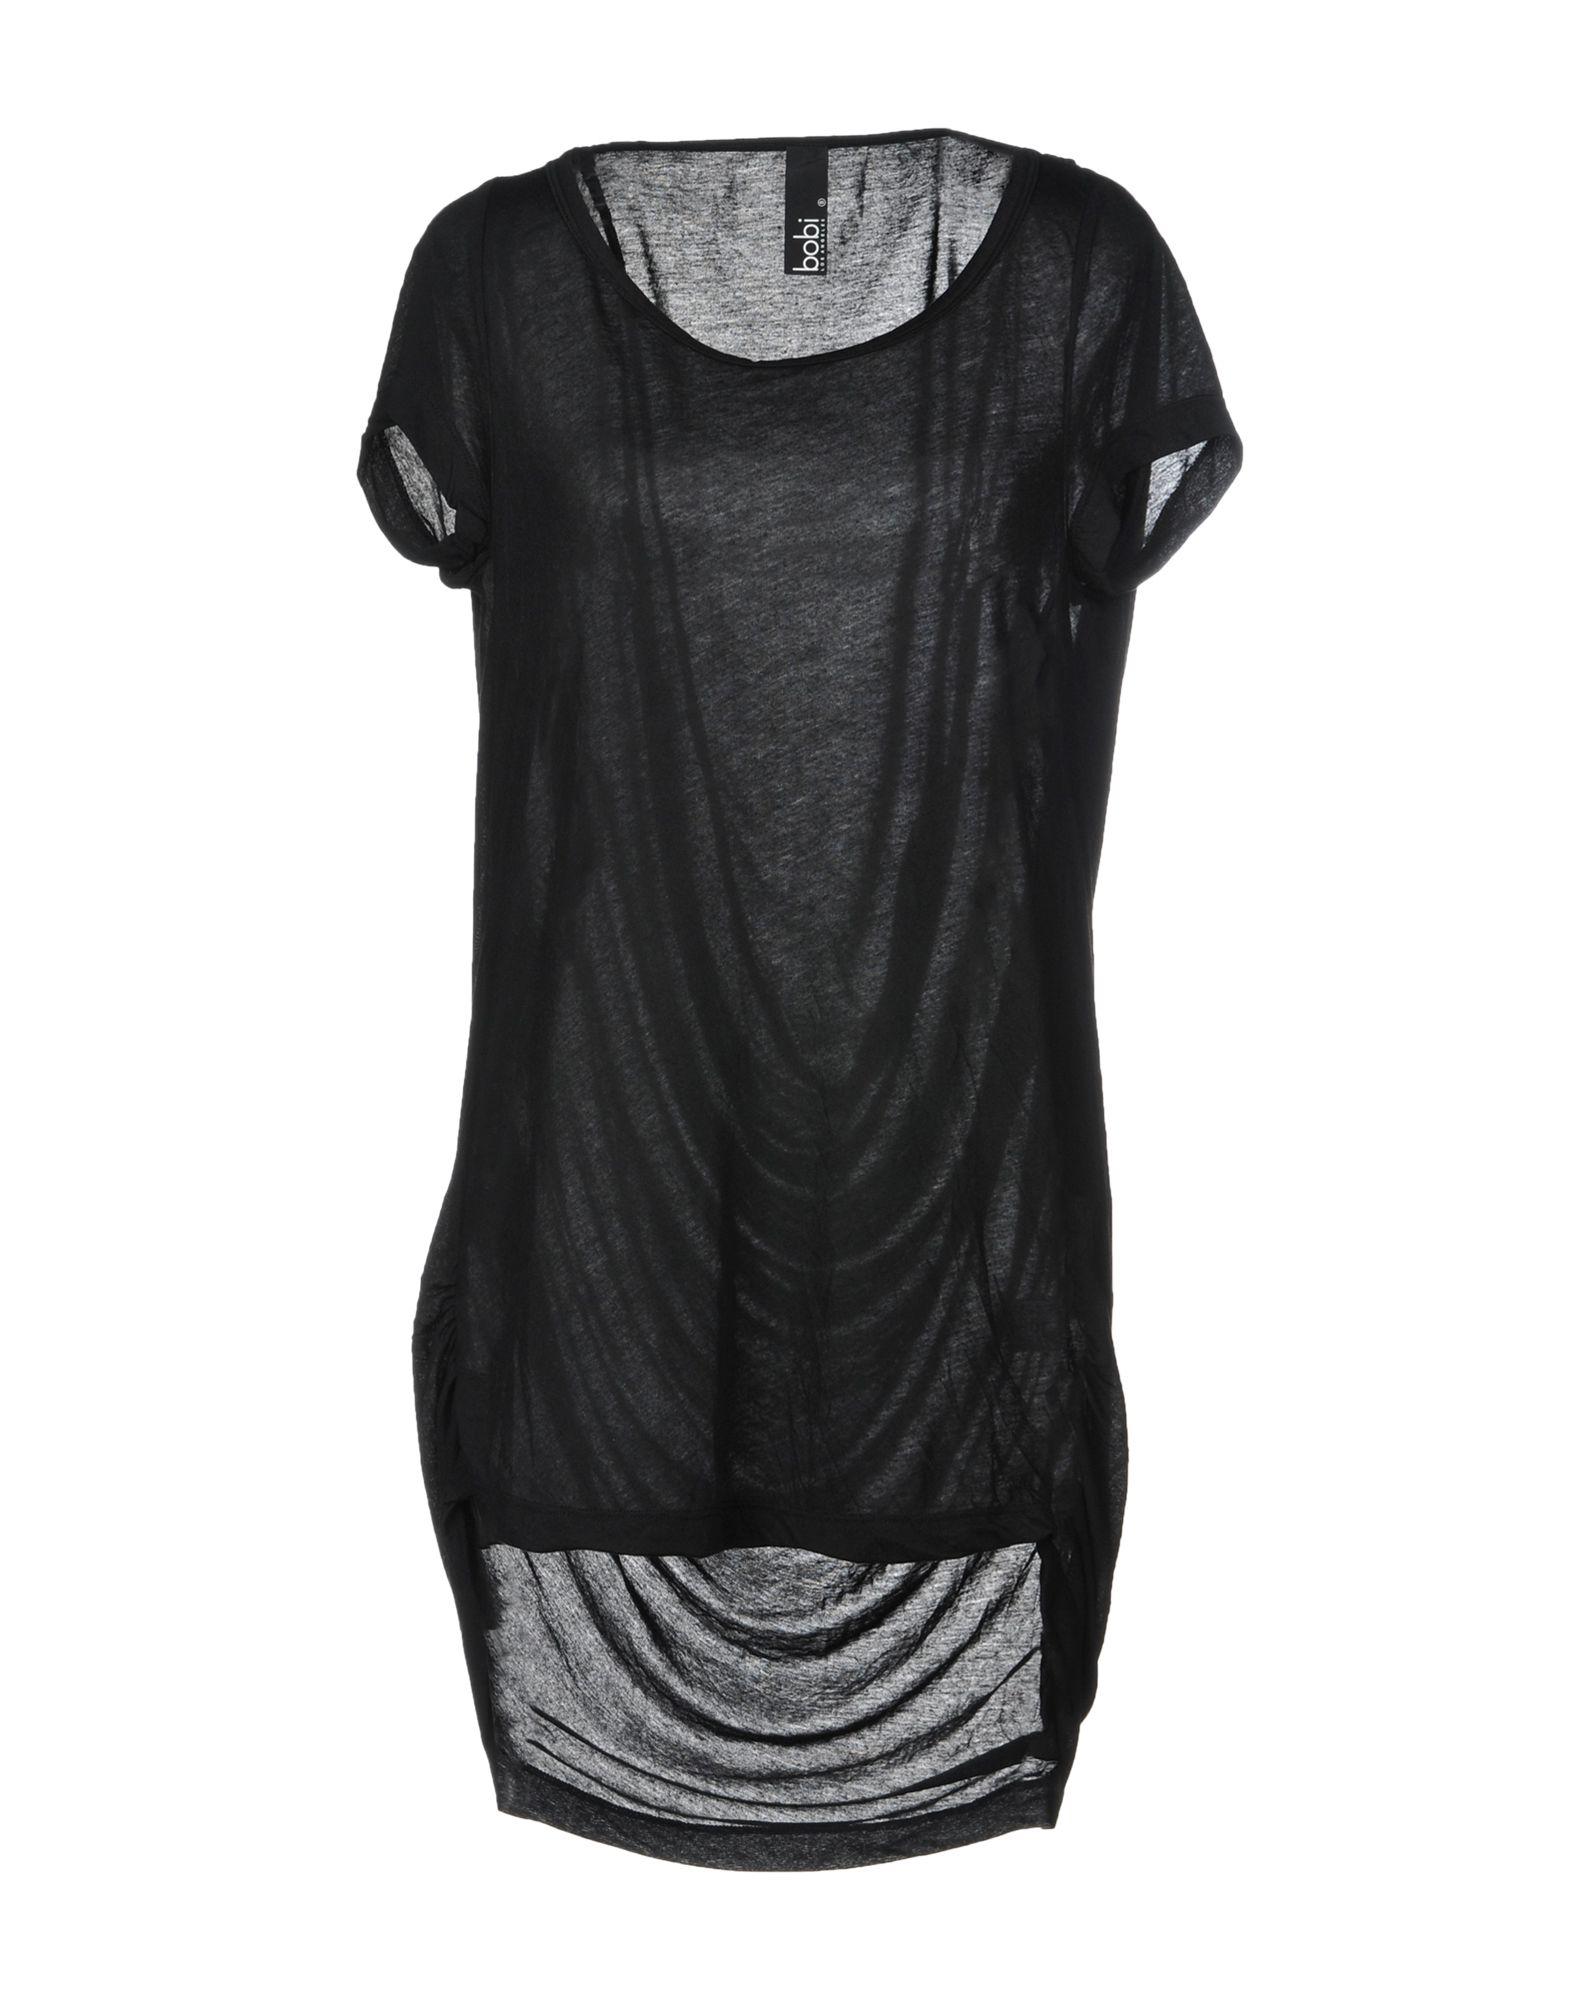 BOBI T-Shirt in Black